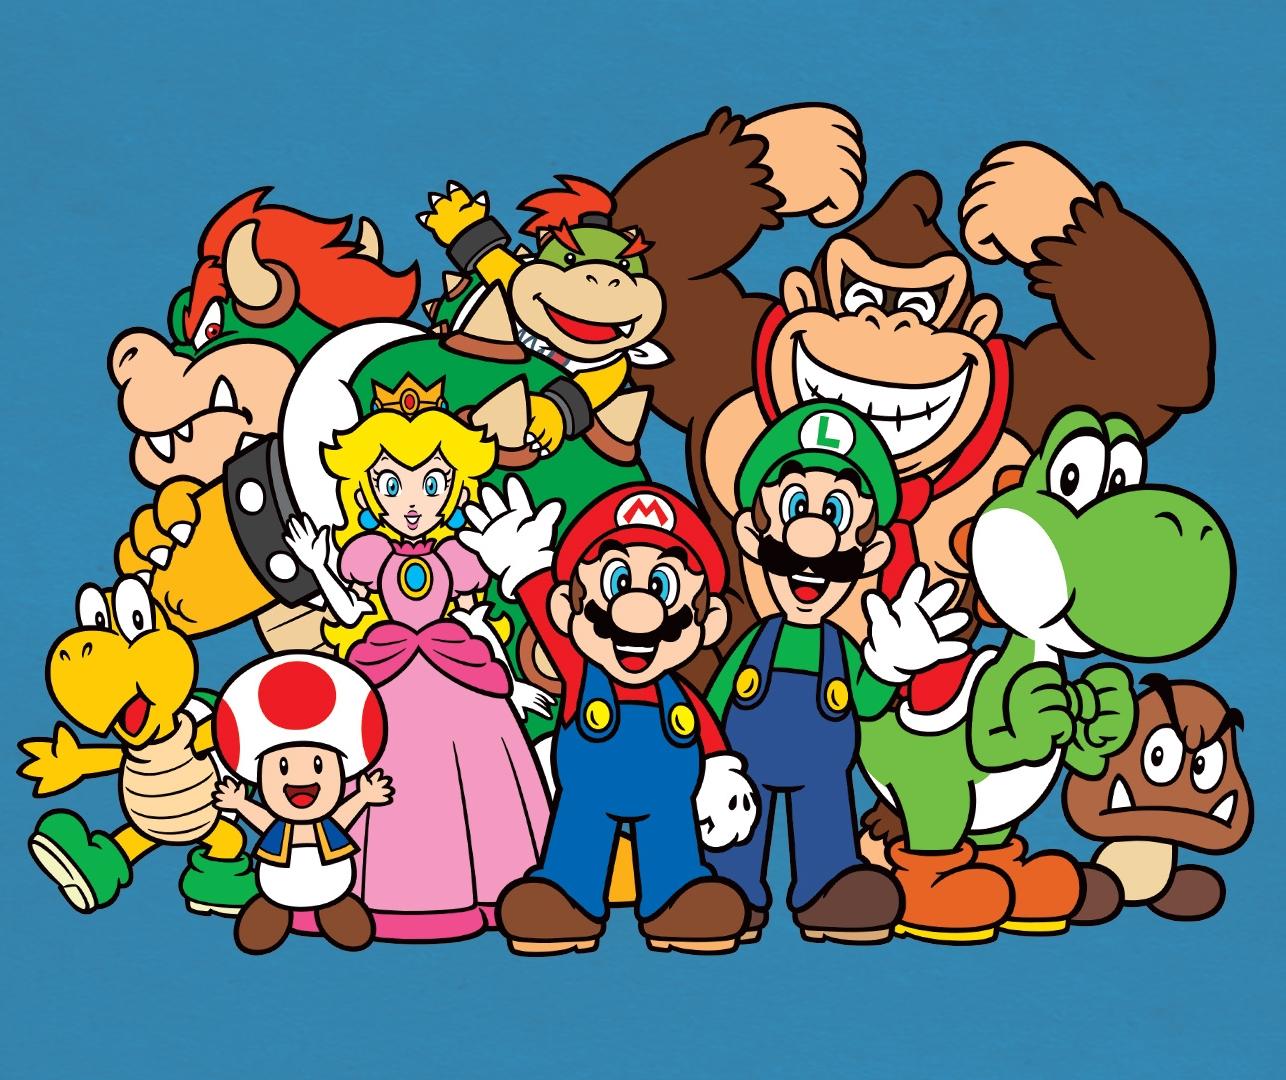 video-games-nintendo-game-squad-oficial.jpg